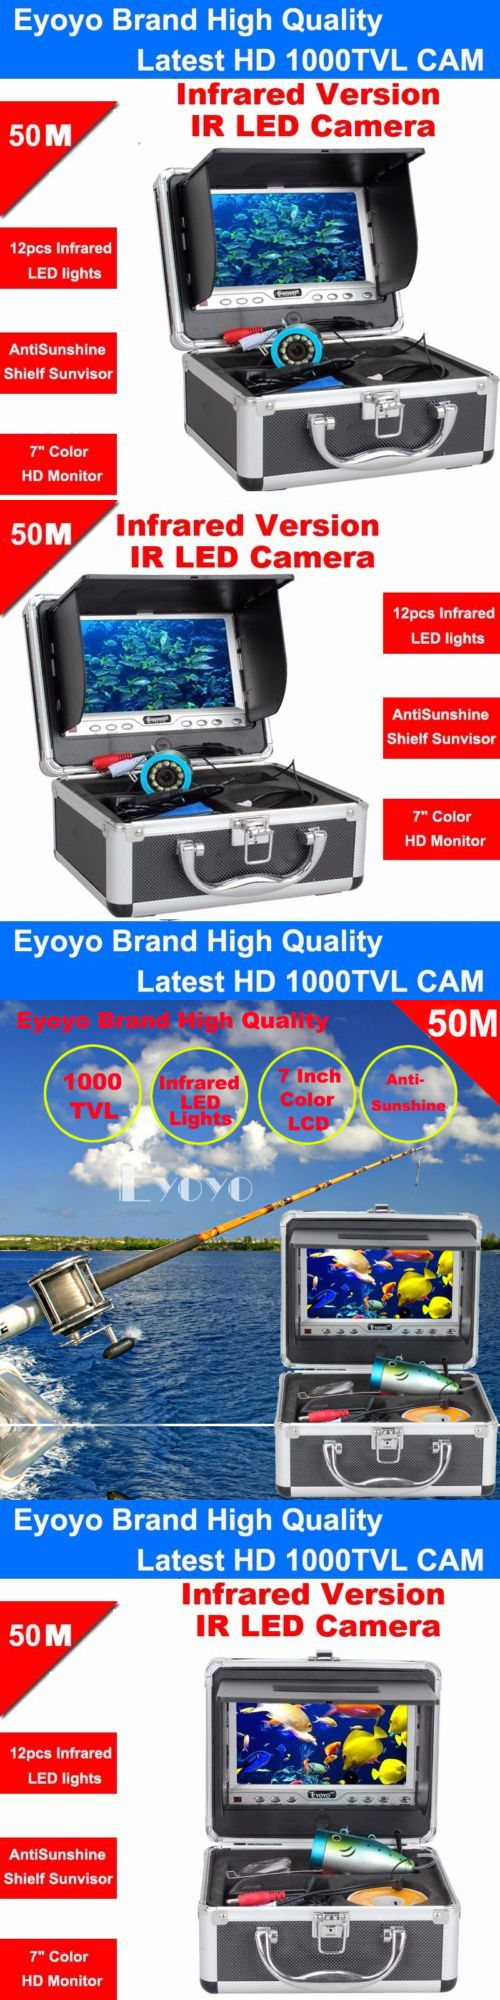 Underwater Cameras 180000: 50M Infrared 1000Tvl Cam Fish Finder Underwater Fishing 7 Anti-Sunshine Monitor -> BUY IT NOW ONLY: $167.39 on eBay!